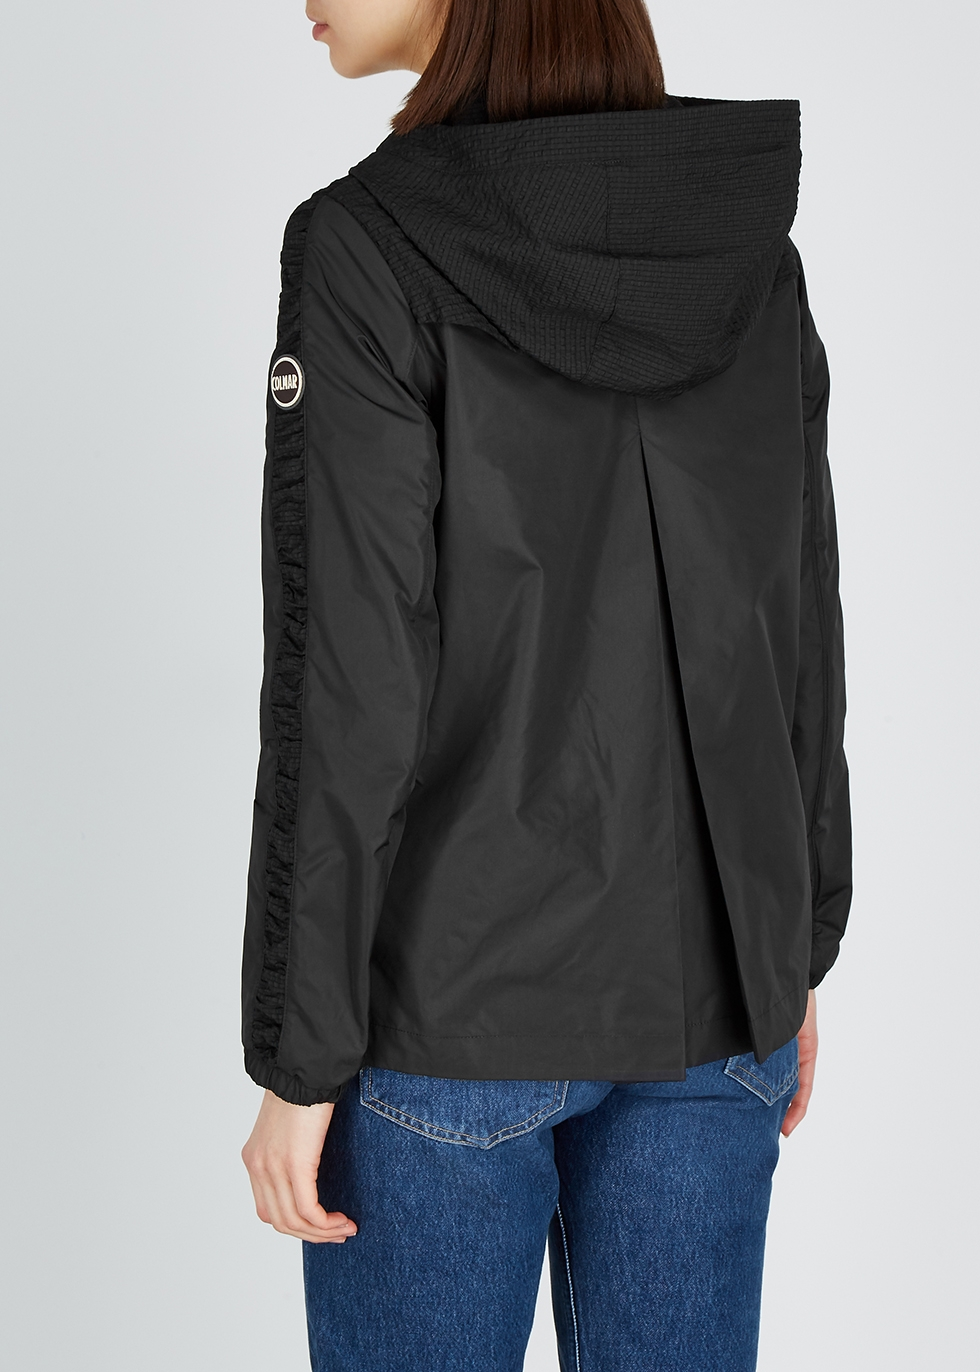 Black hooded shell jacket - Colmar